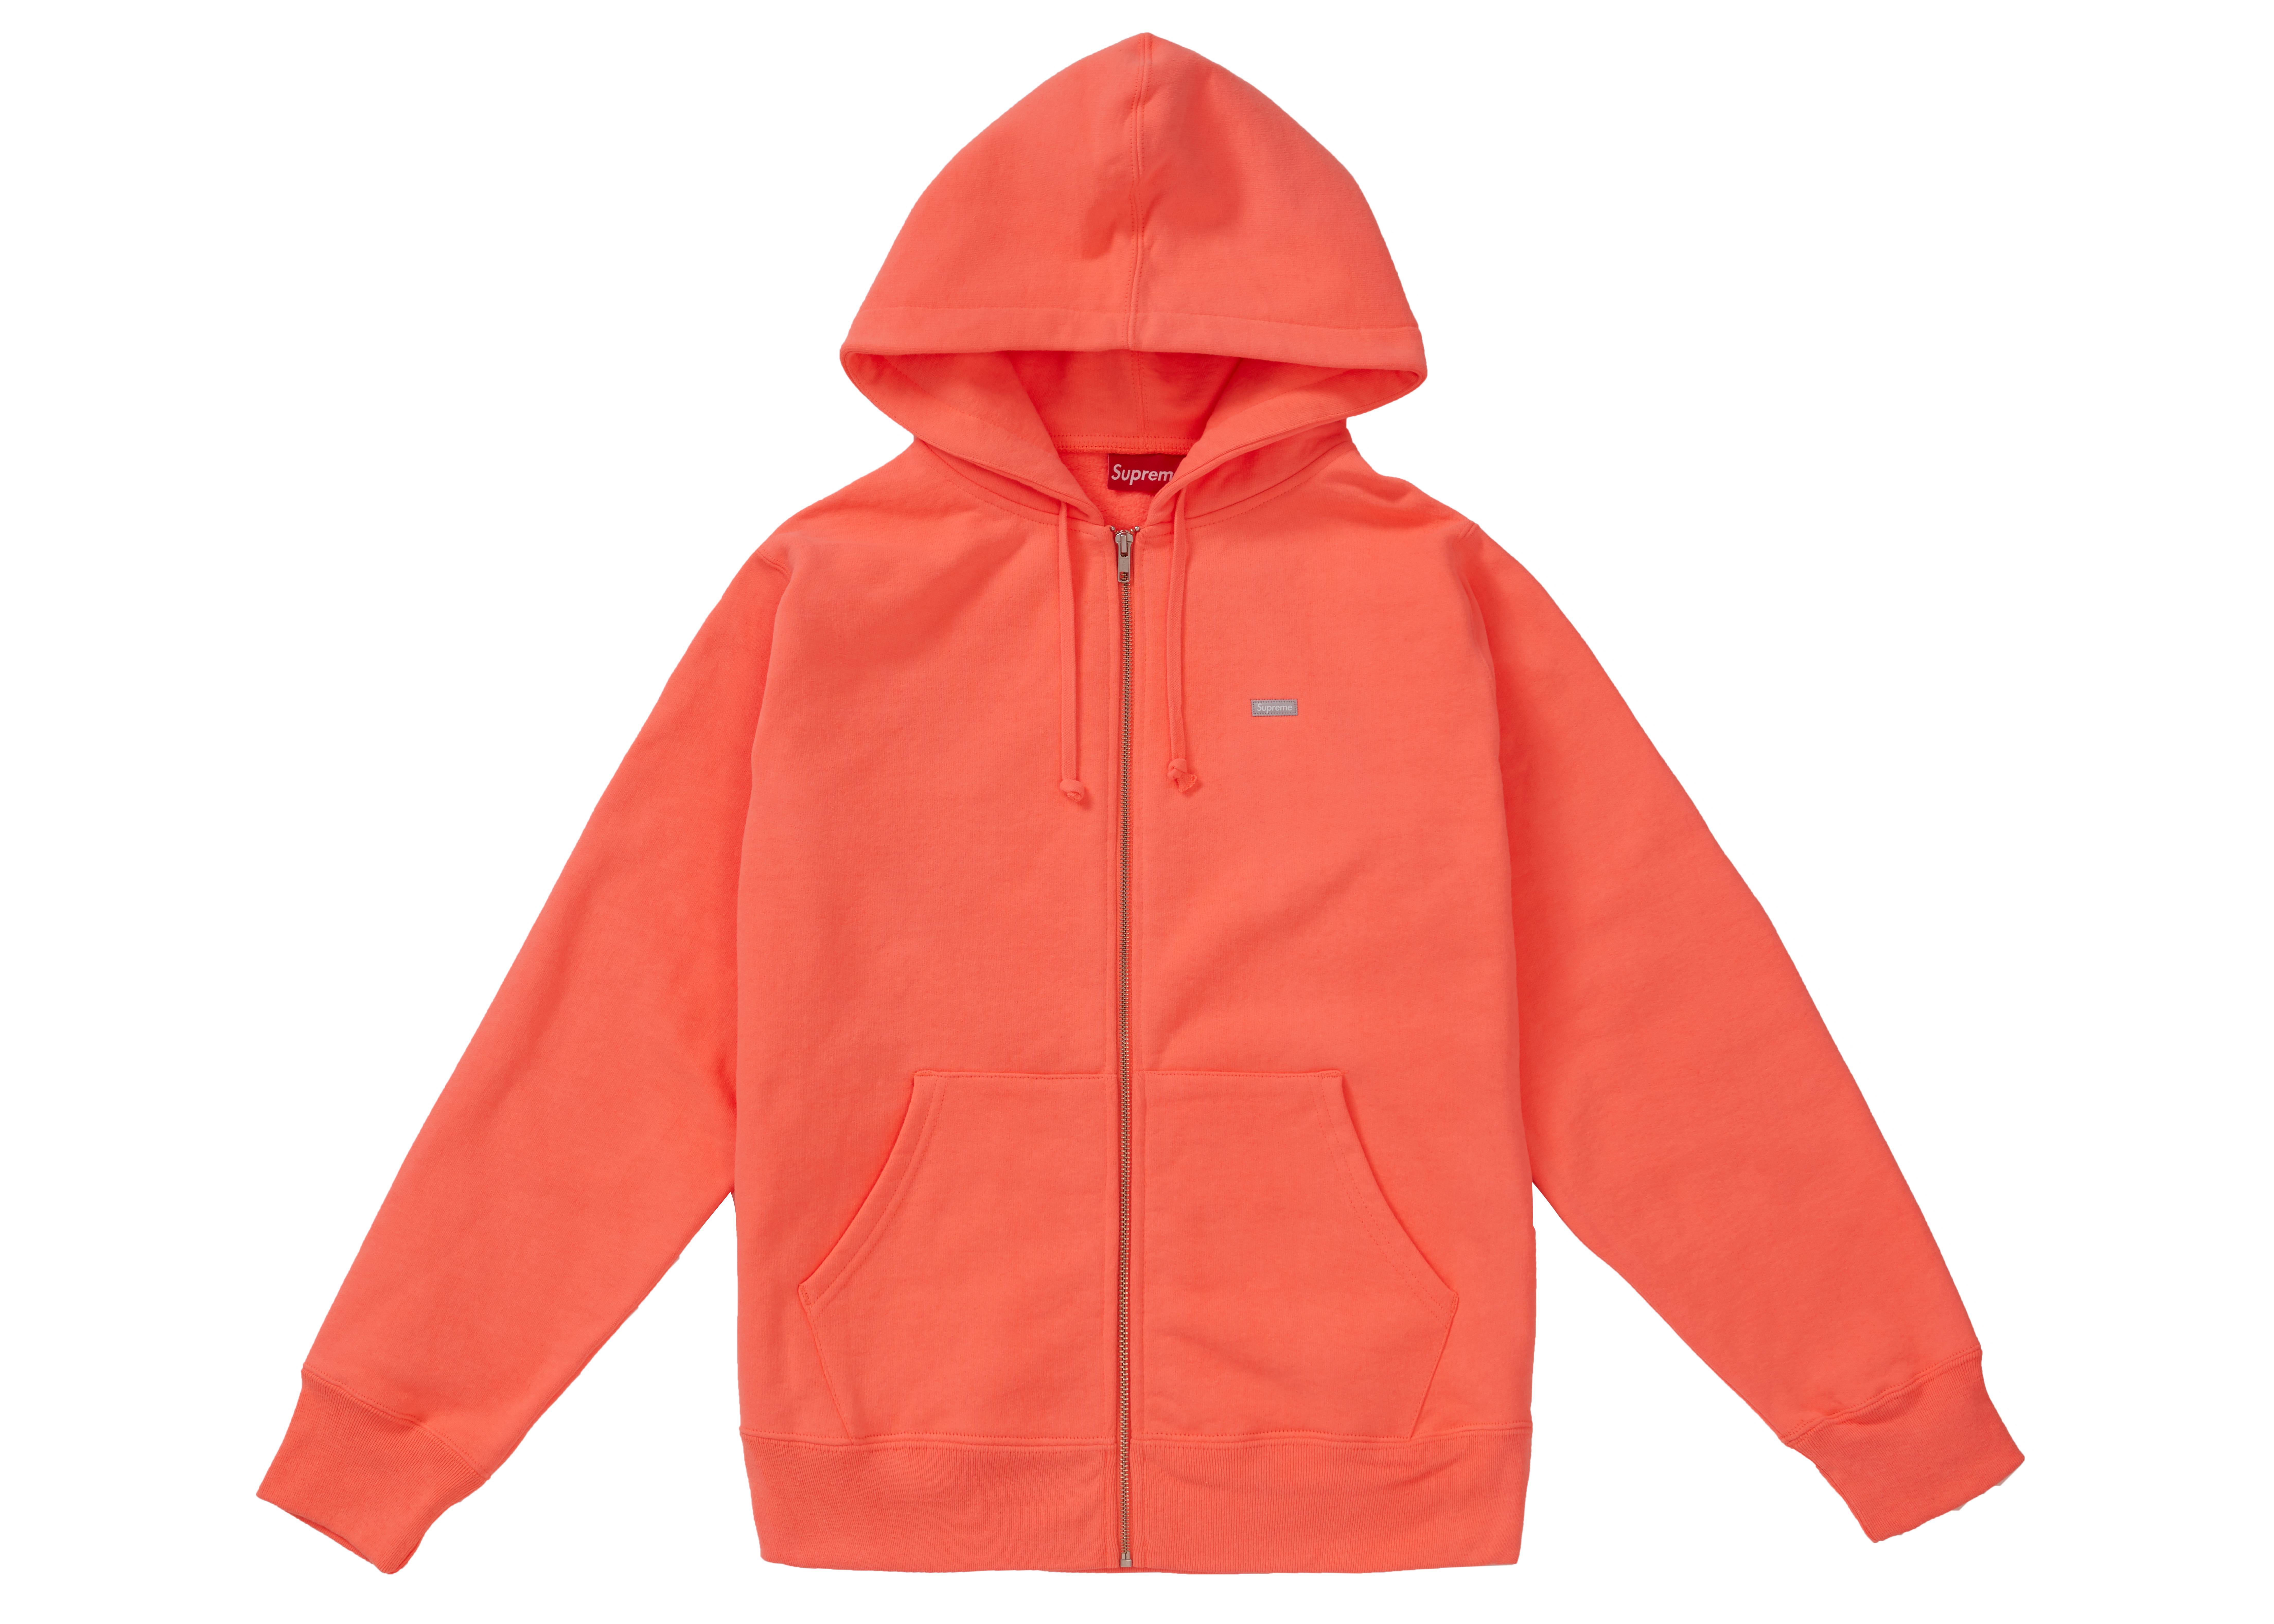 c8d15851eff9 Supreme - Reflective Small Box Zip Up Sweatshirt Fluorescent Pink for Men -  Lyst. View fullscreen